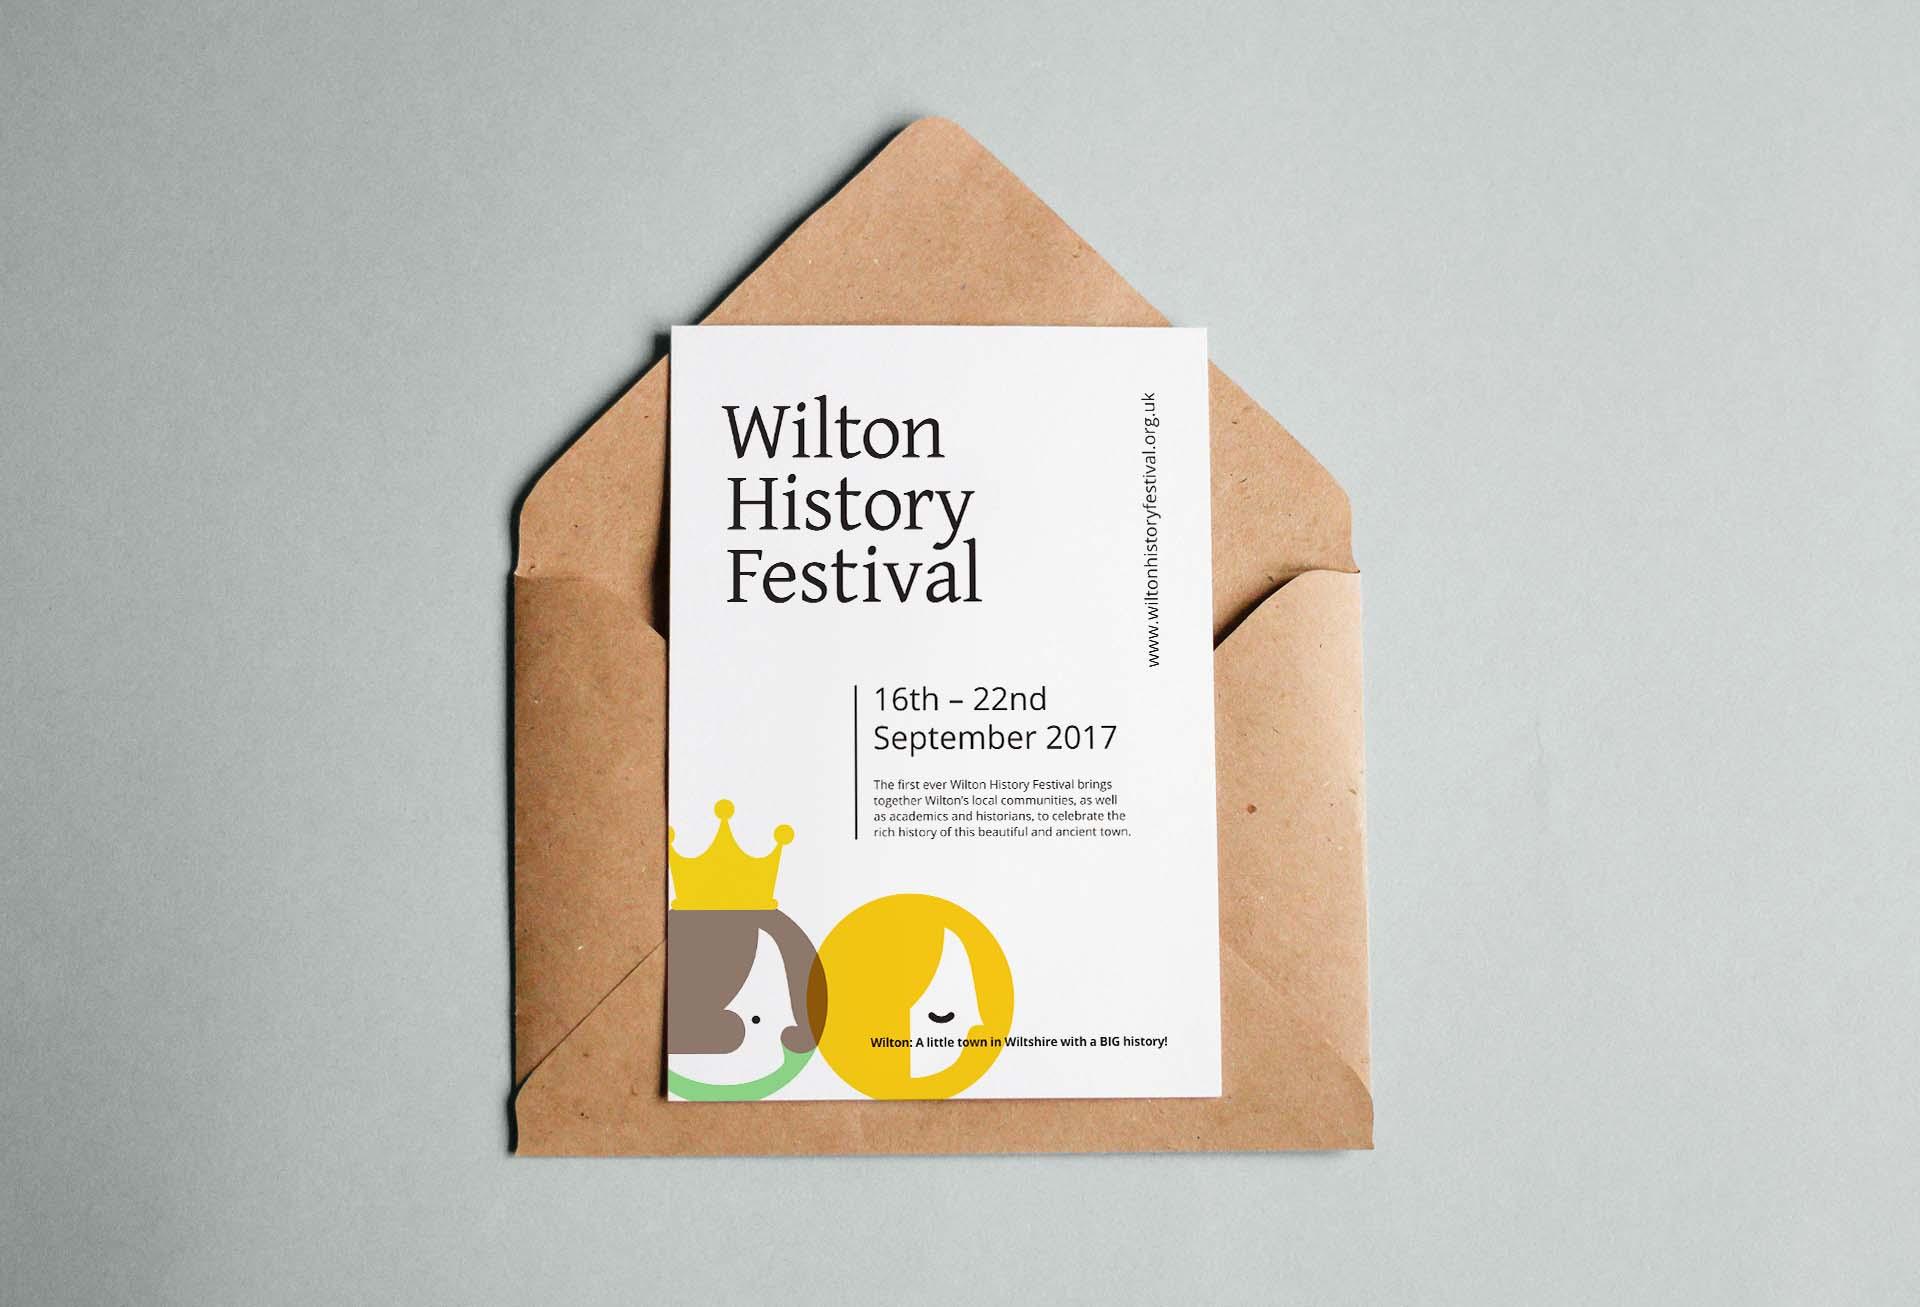 WiltonHistoryFestival_Flyer